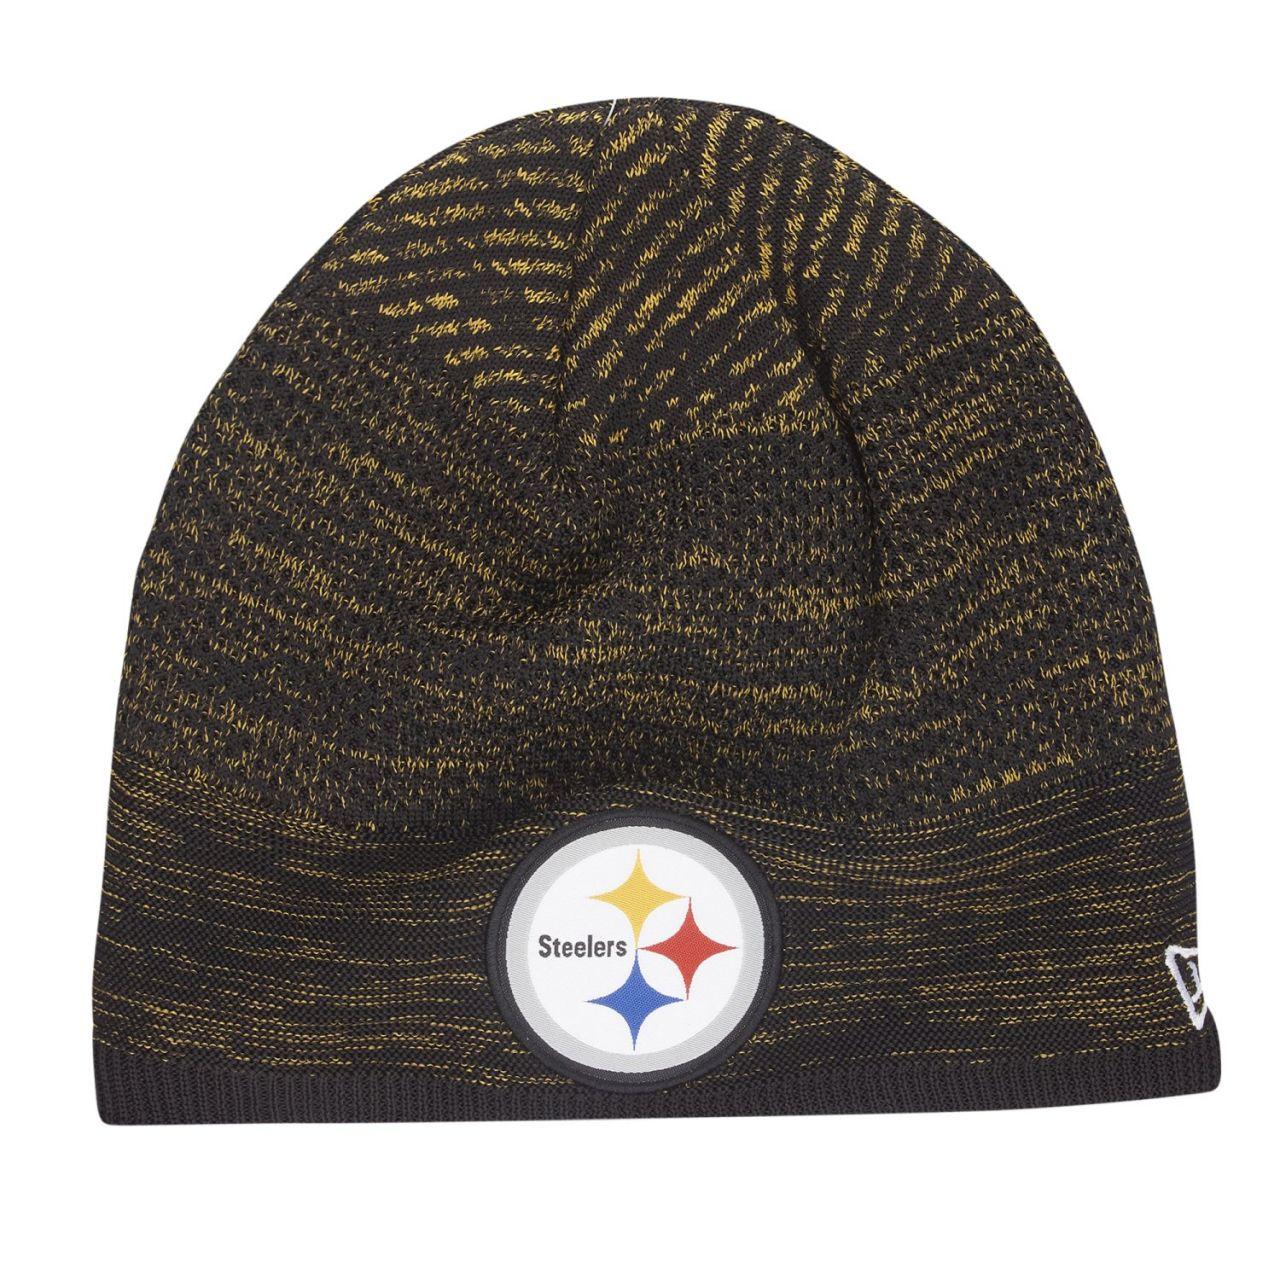 amfoo - New Era TECH KNIT Wintermütze NFL Beanie Pittsburgh Steelers